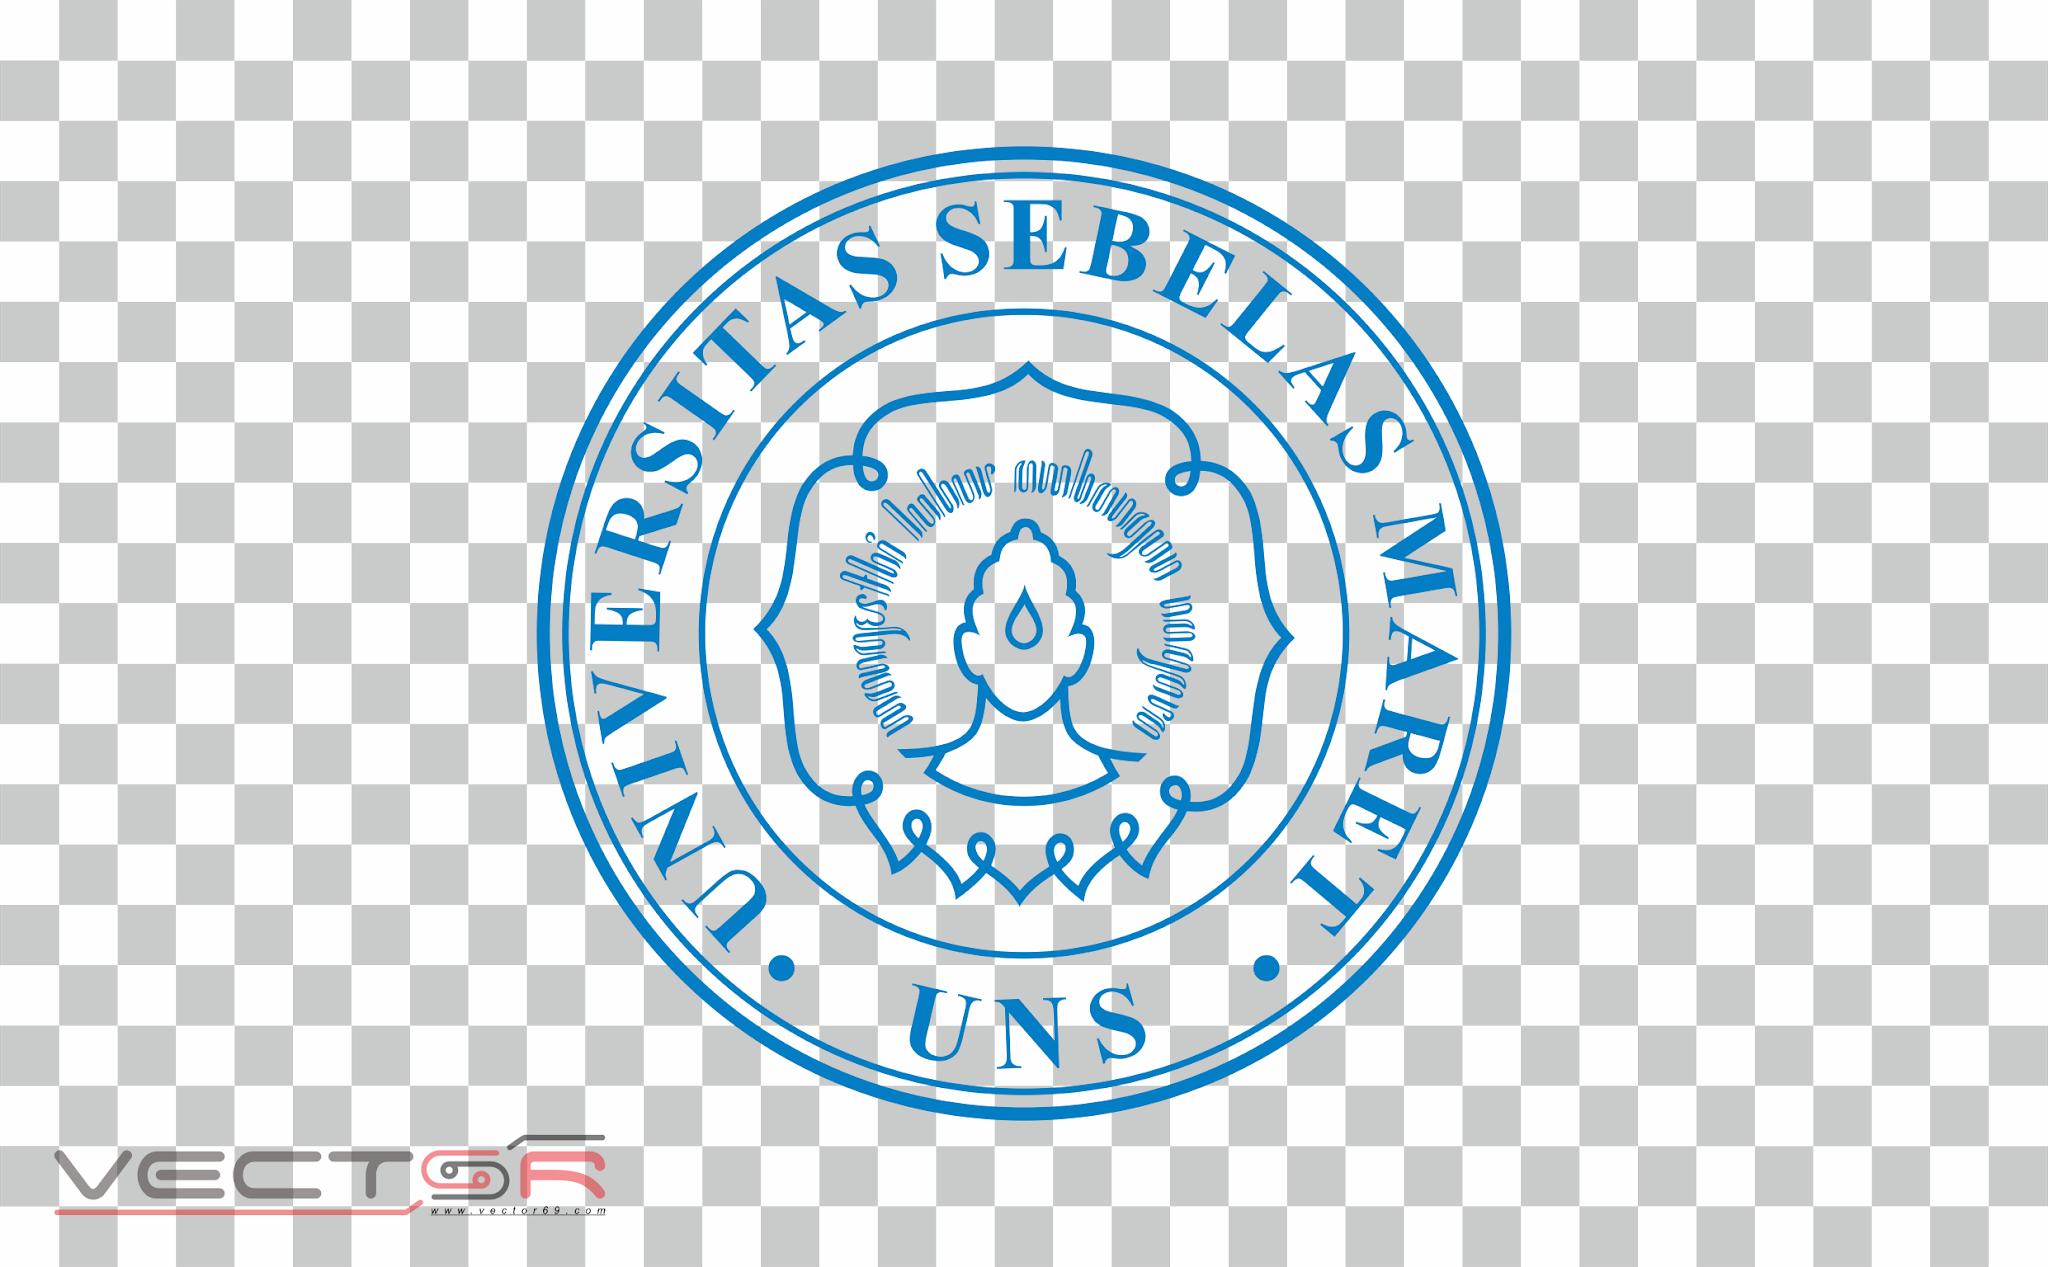 Logo UNS (Universitas Sebelas Maret) - Download .PNG (Portable Network Graphics) Transparent Images